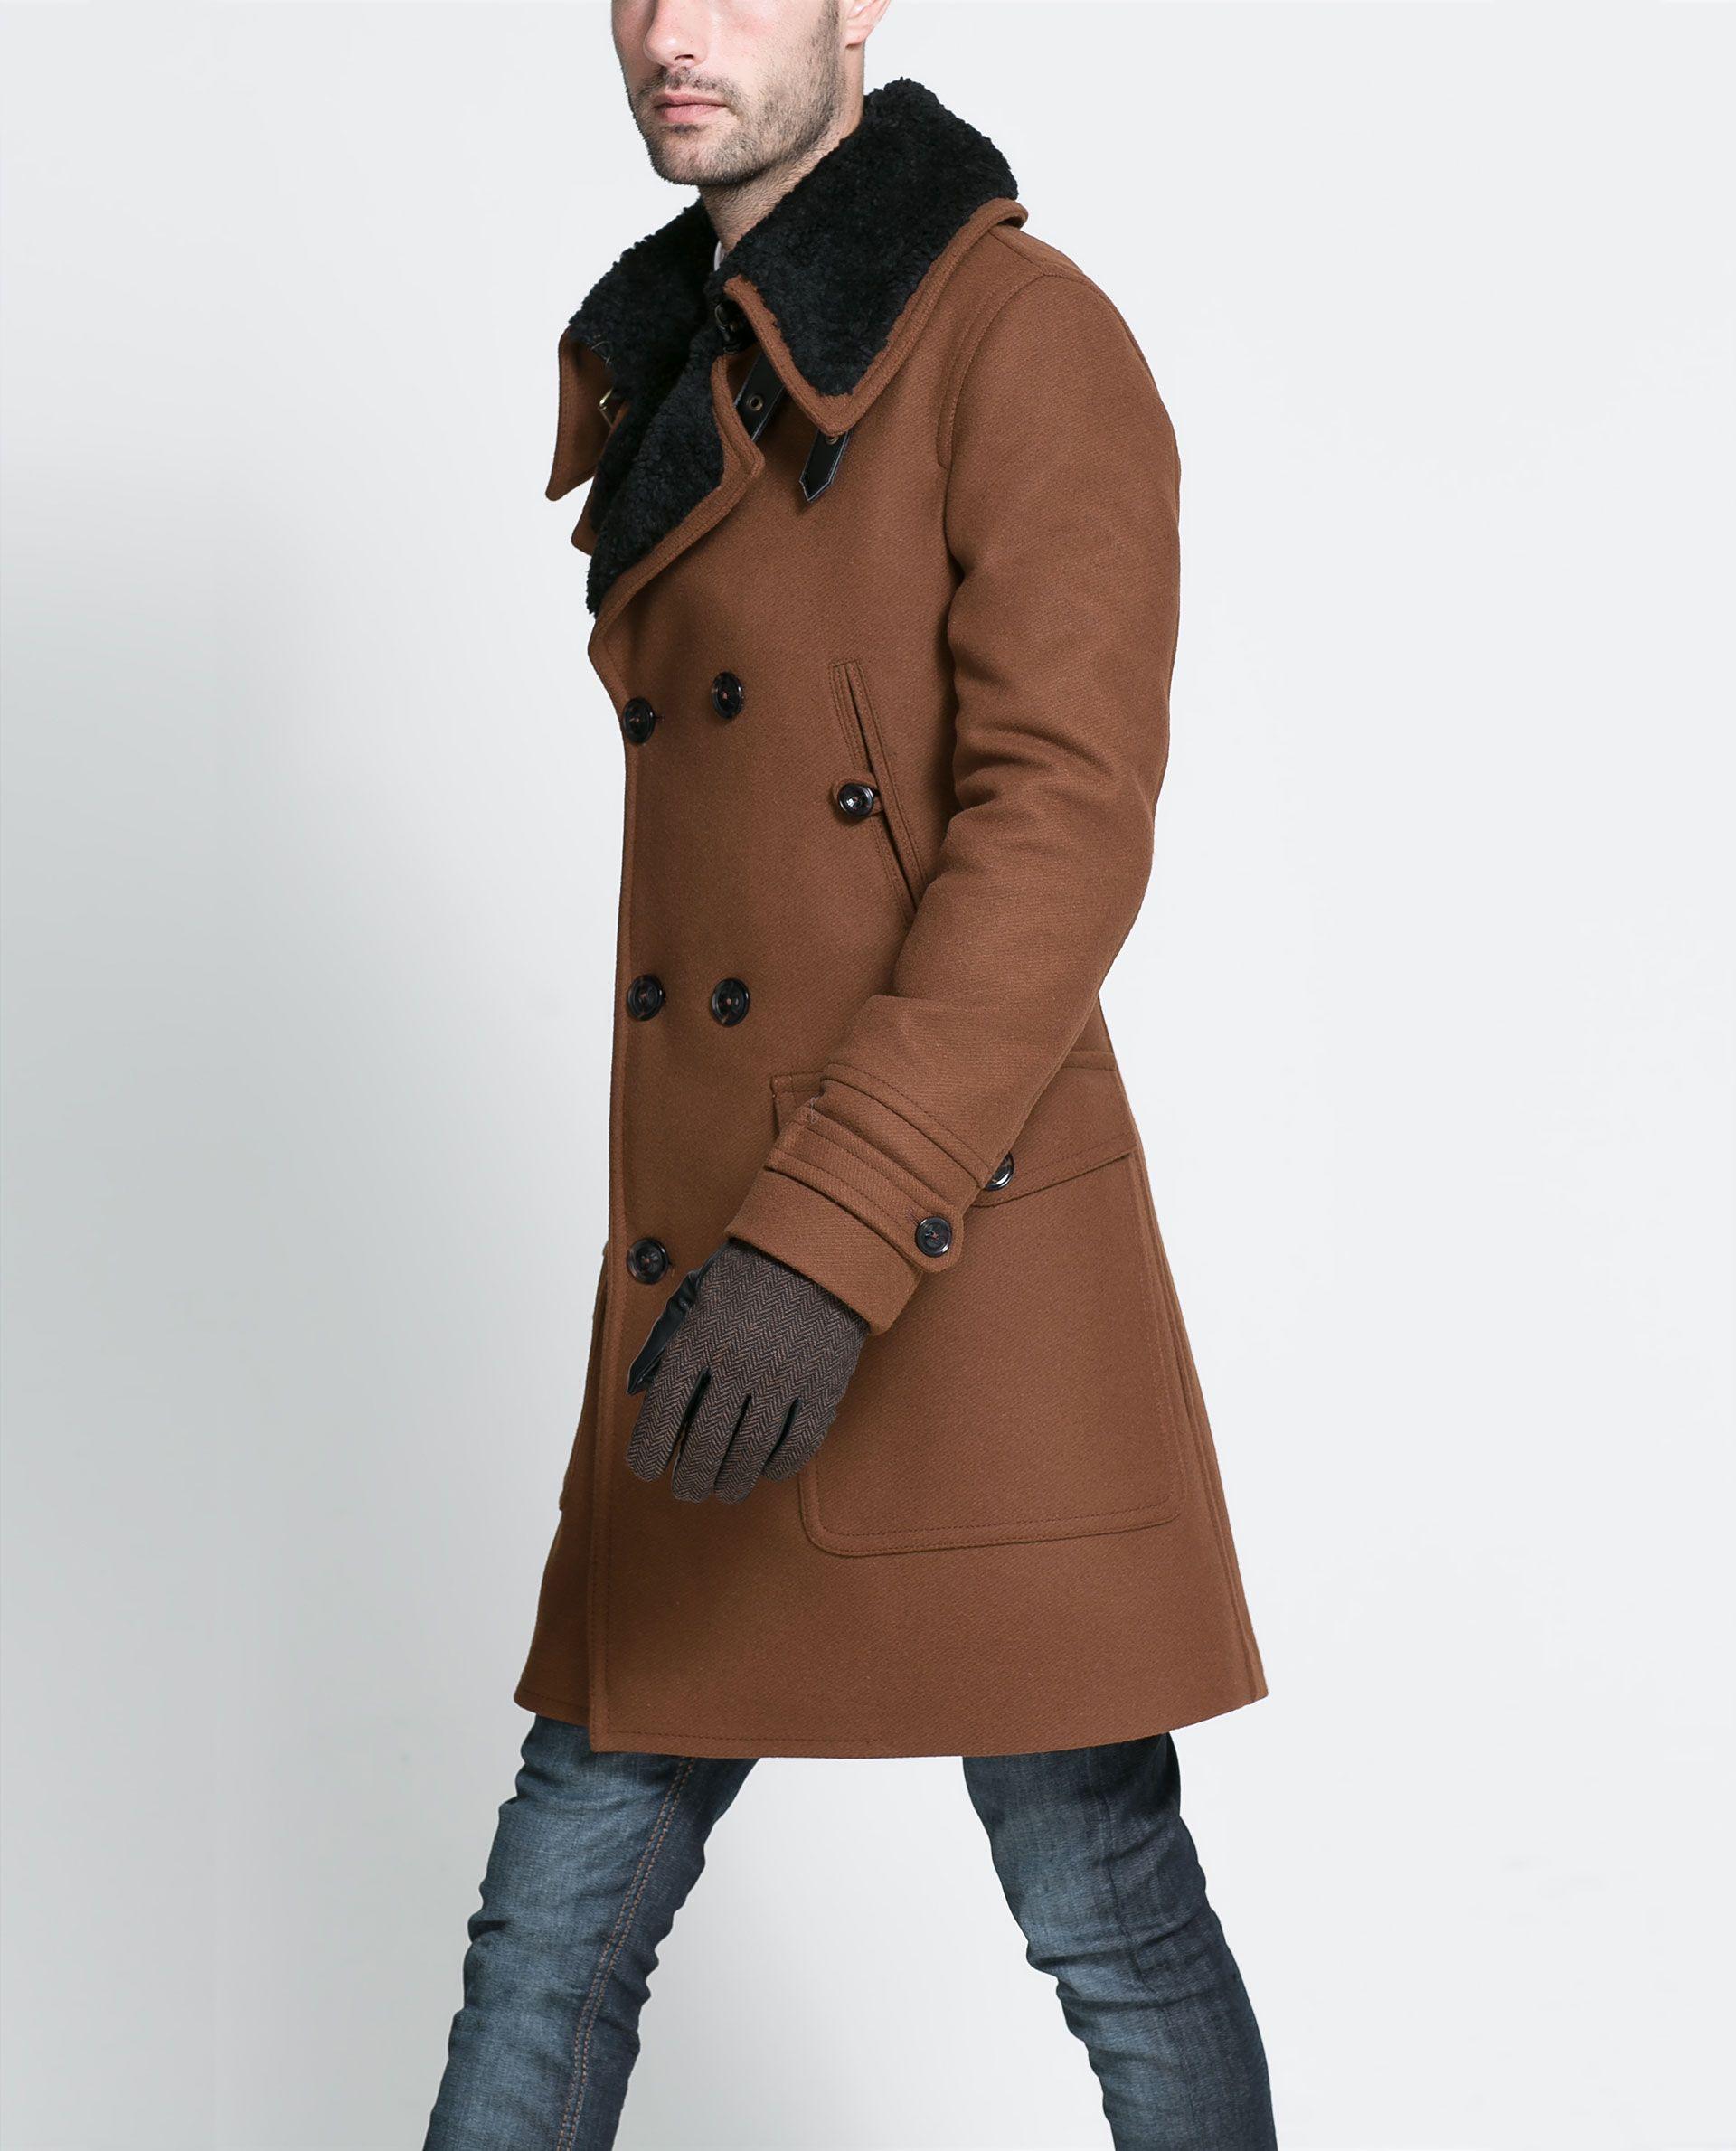 020aabb97b65 COAT WITH FUR COLLAR - Coats and Trench coats - Man